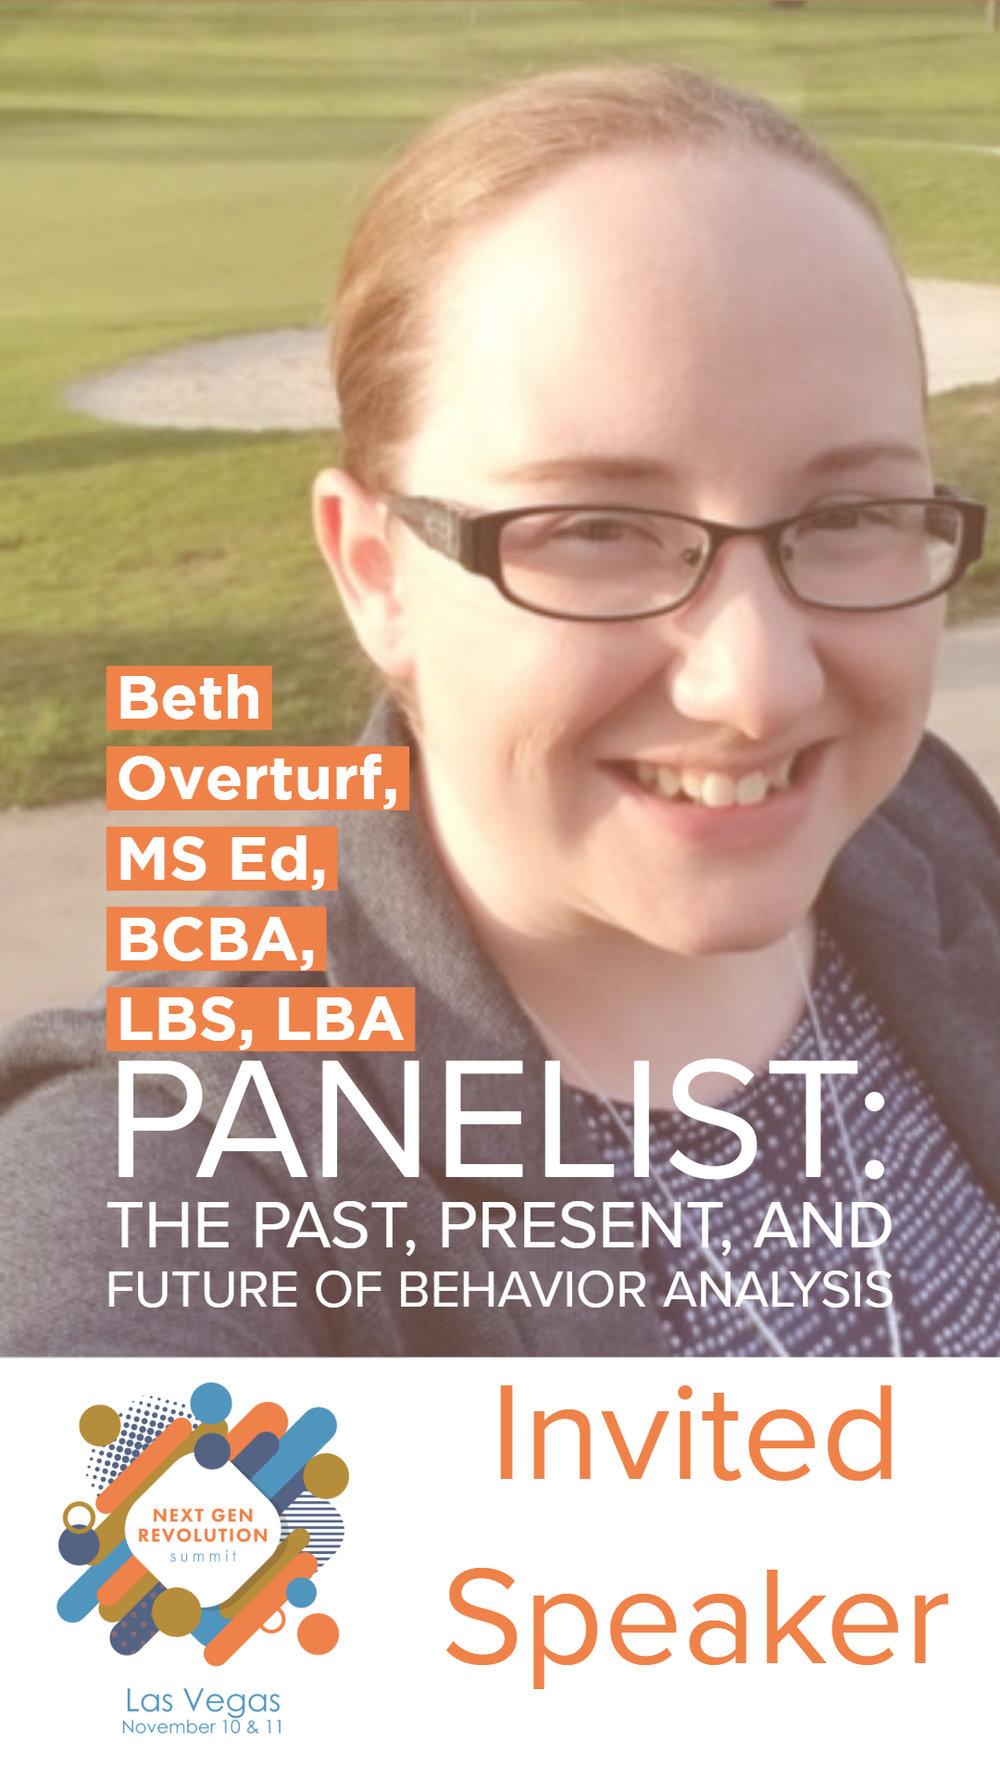 Beth Garrison, MS.Ed., BCBA, LBS, LBA